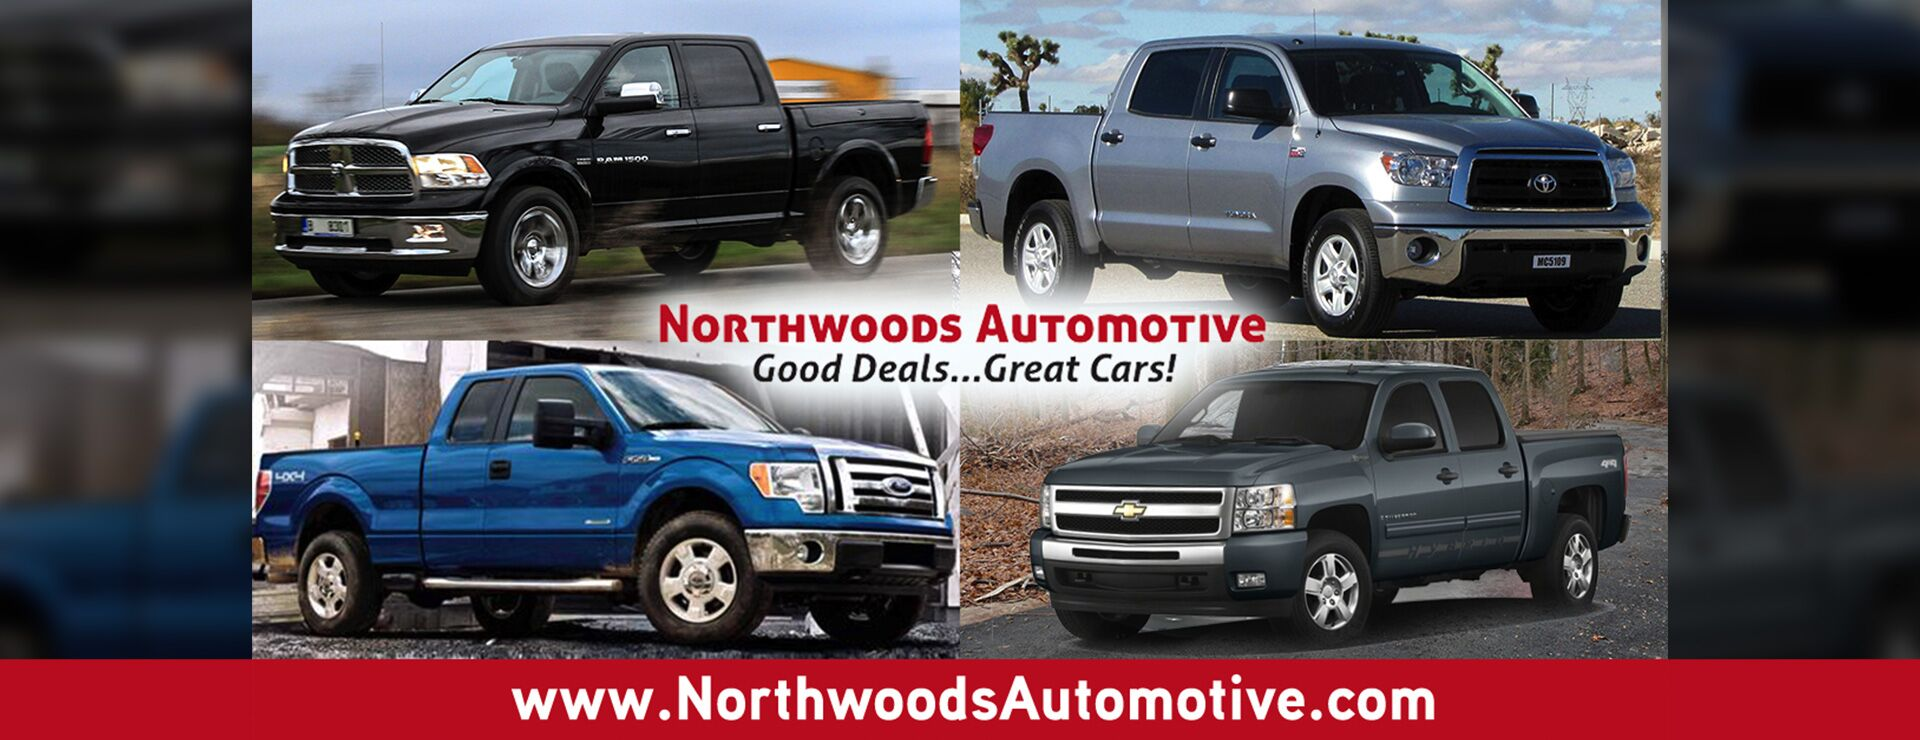 Used Vehicle Dealership North Charleston SC   Northwoods